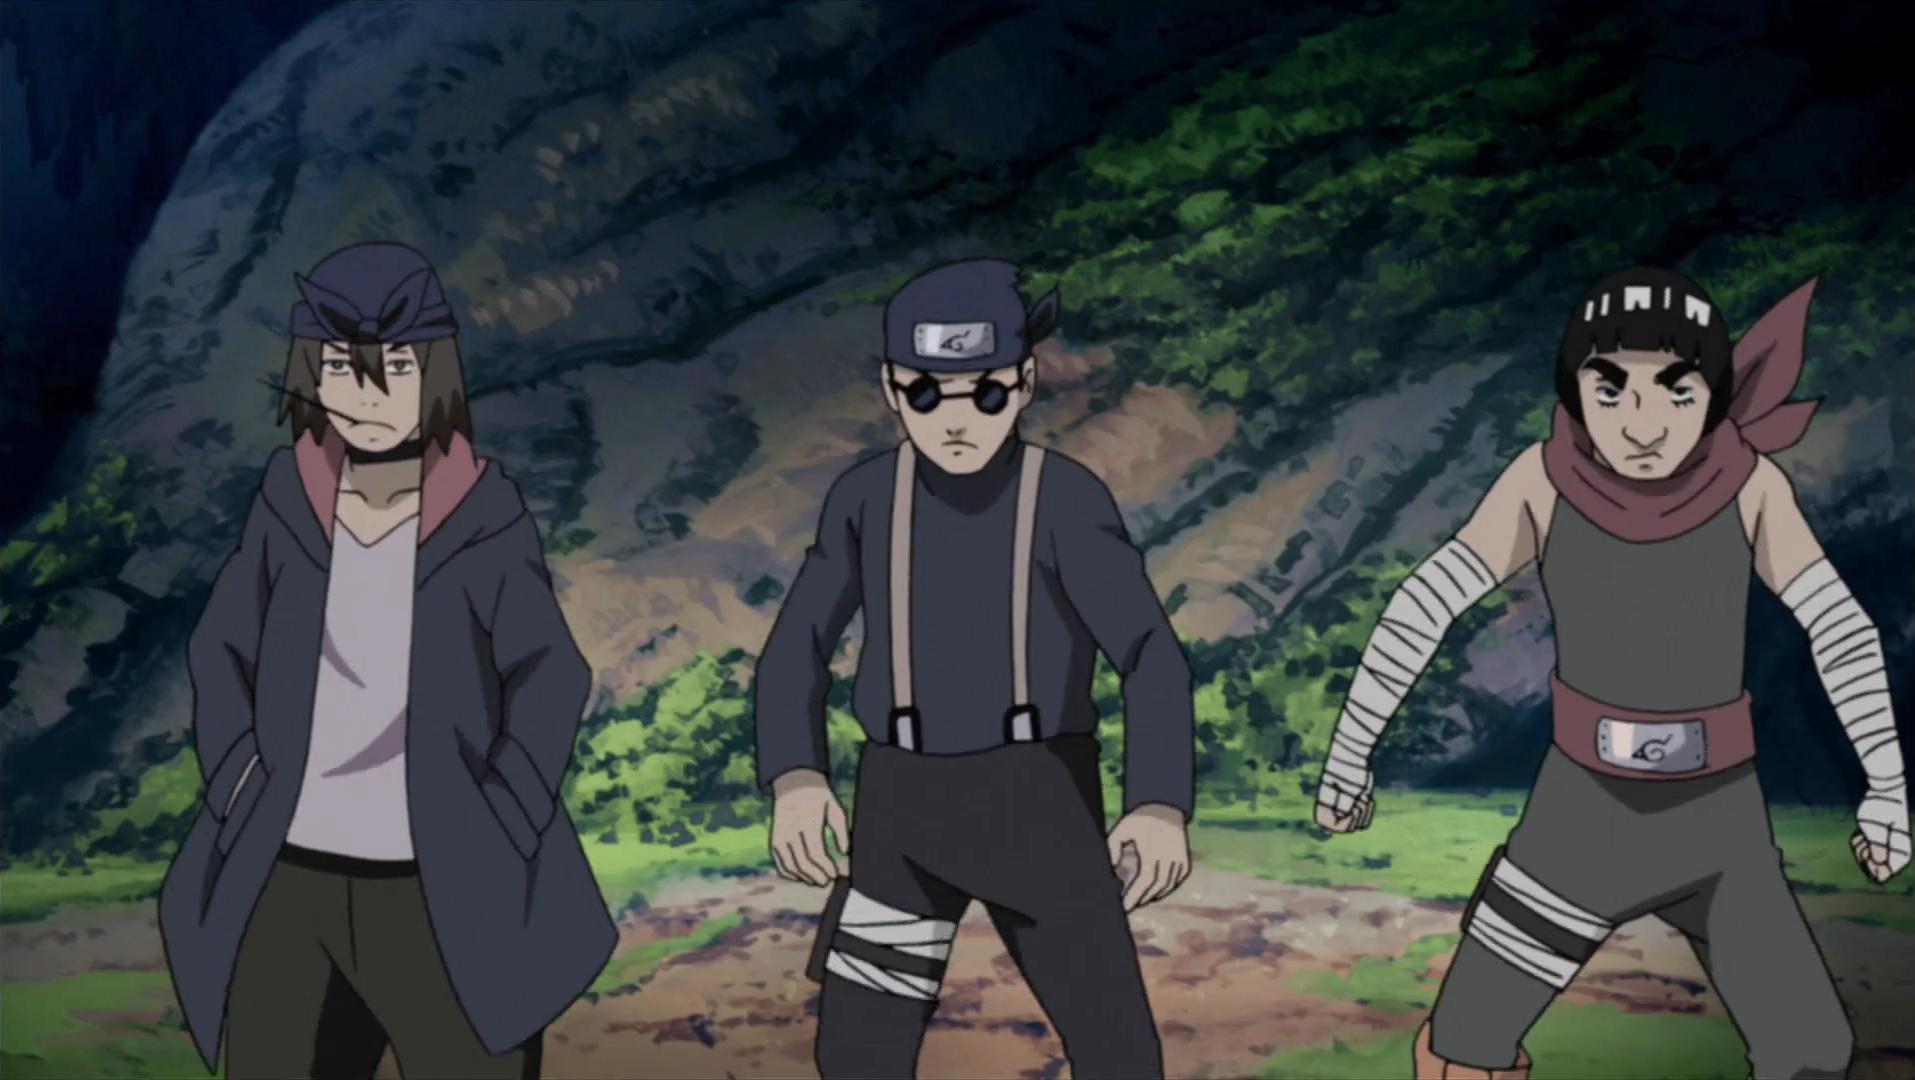 Two Dudes Of Naruto